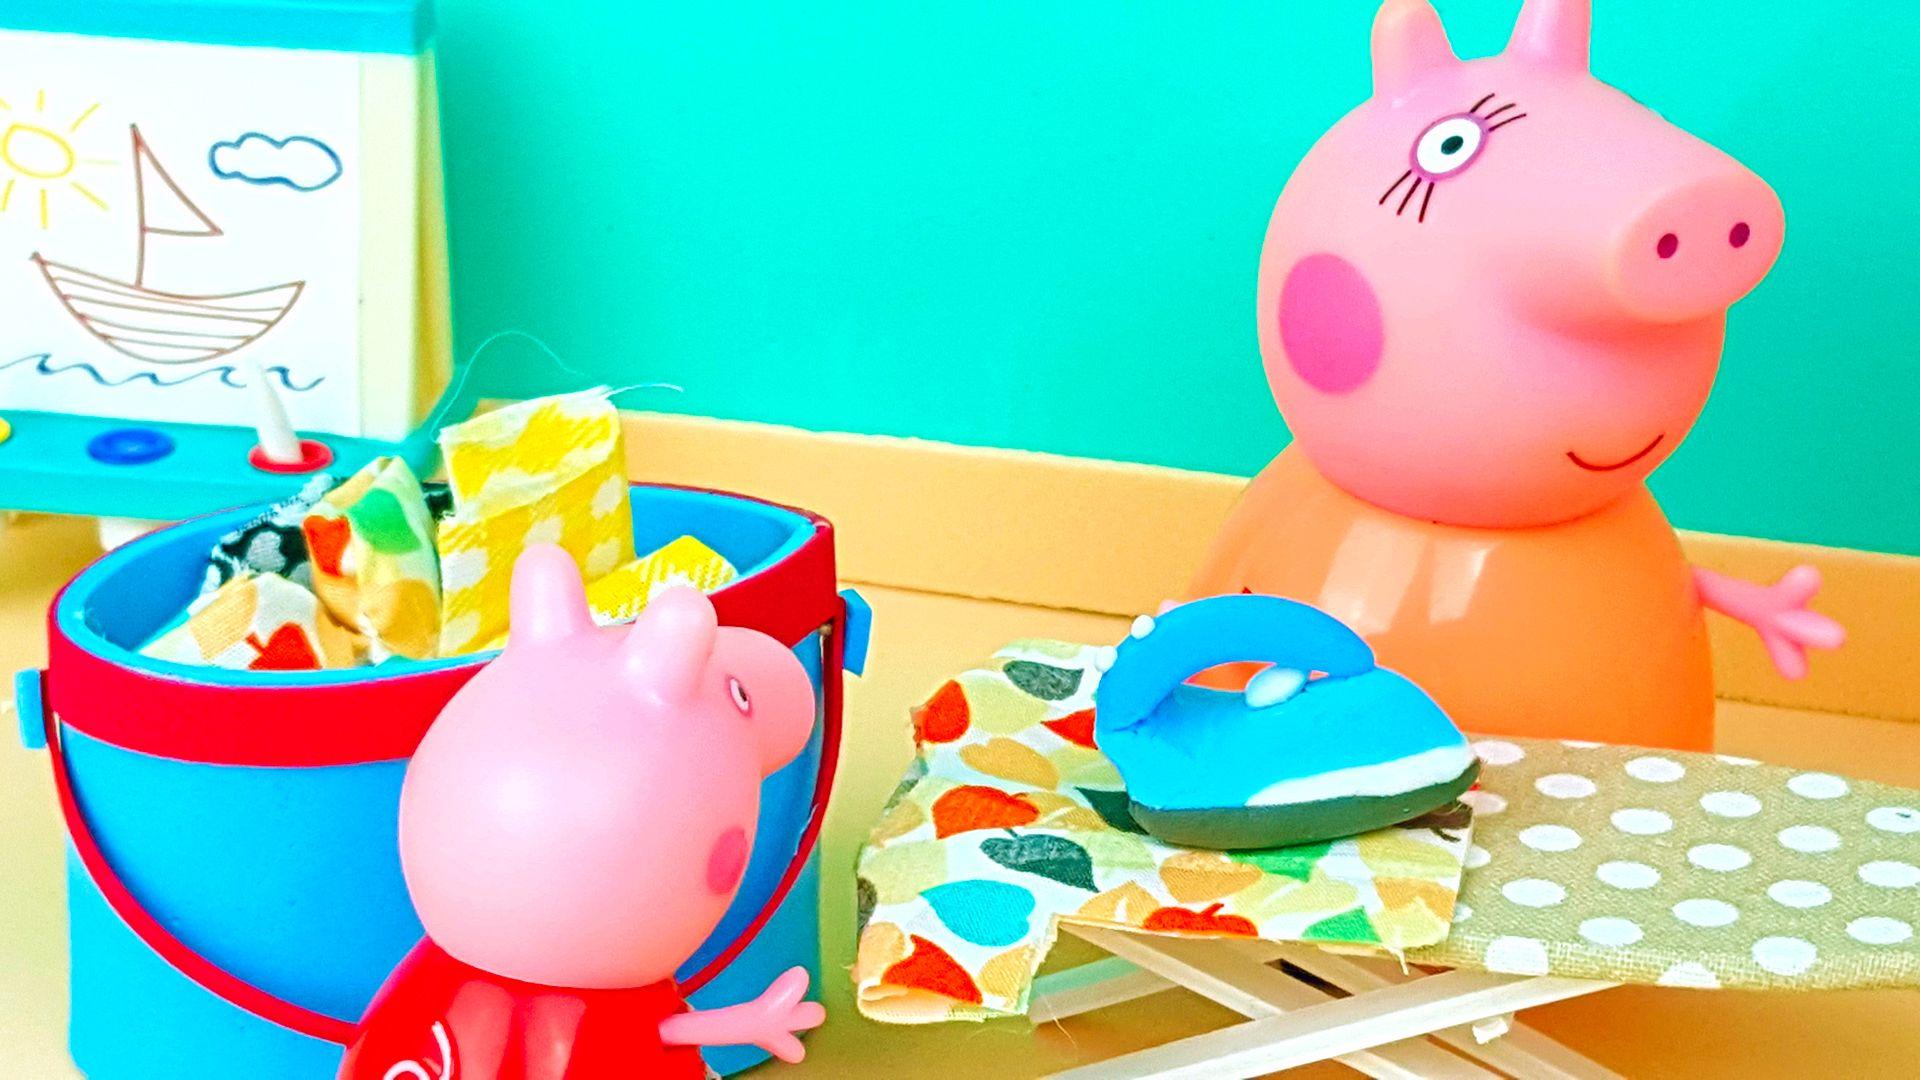 Ironing A Shirt Peppa Pig English Episodes New Episodes 2019